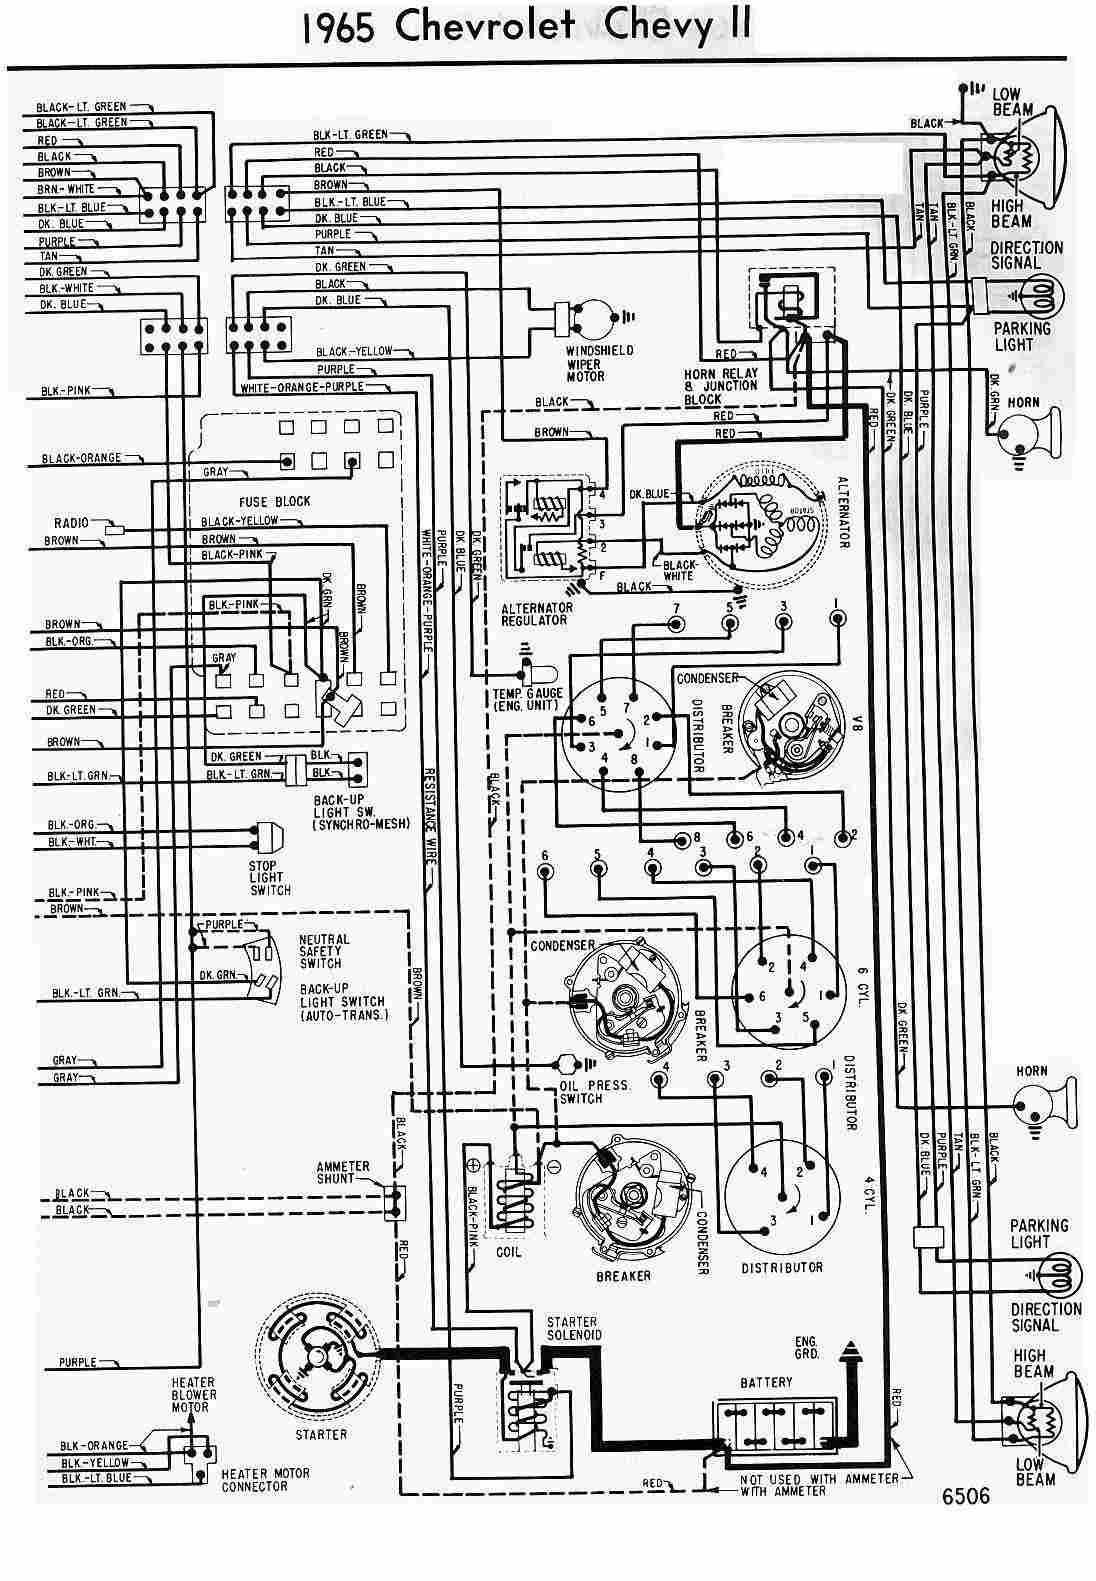 2011 chevy aveo ignition wiring diagram w wiring impala diagrams wiring diagrams schematicsrh  [ 1096 x 1581 Pixel ]